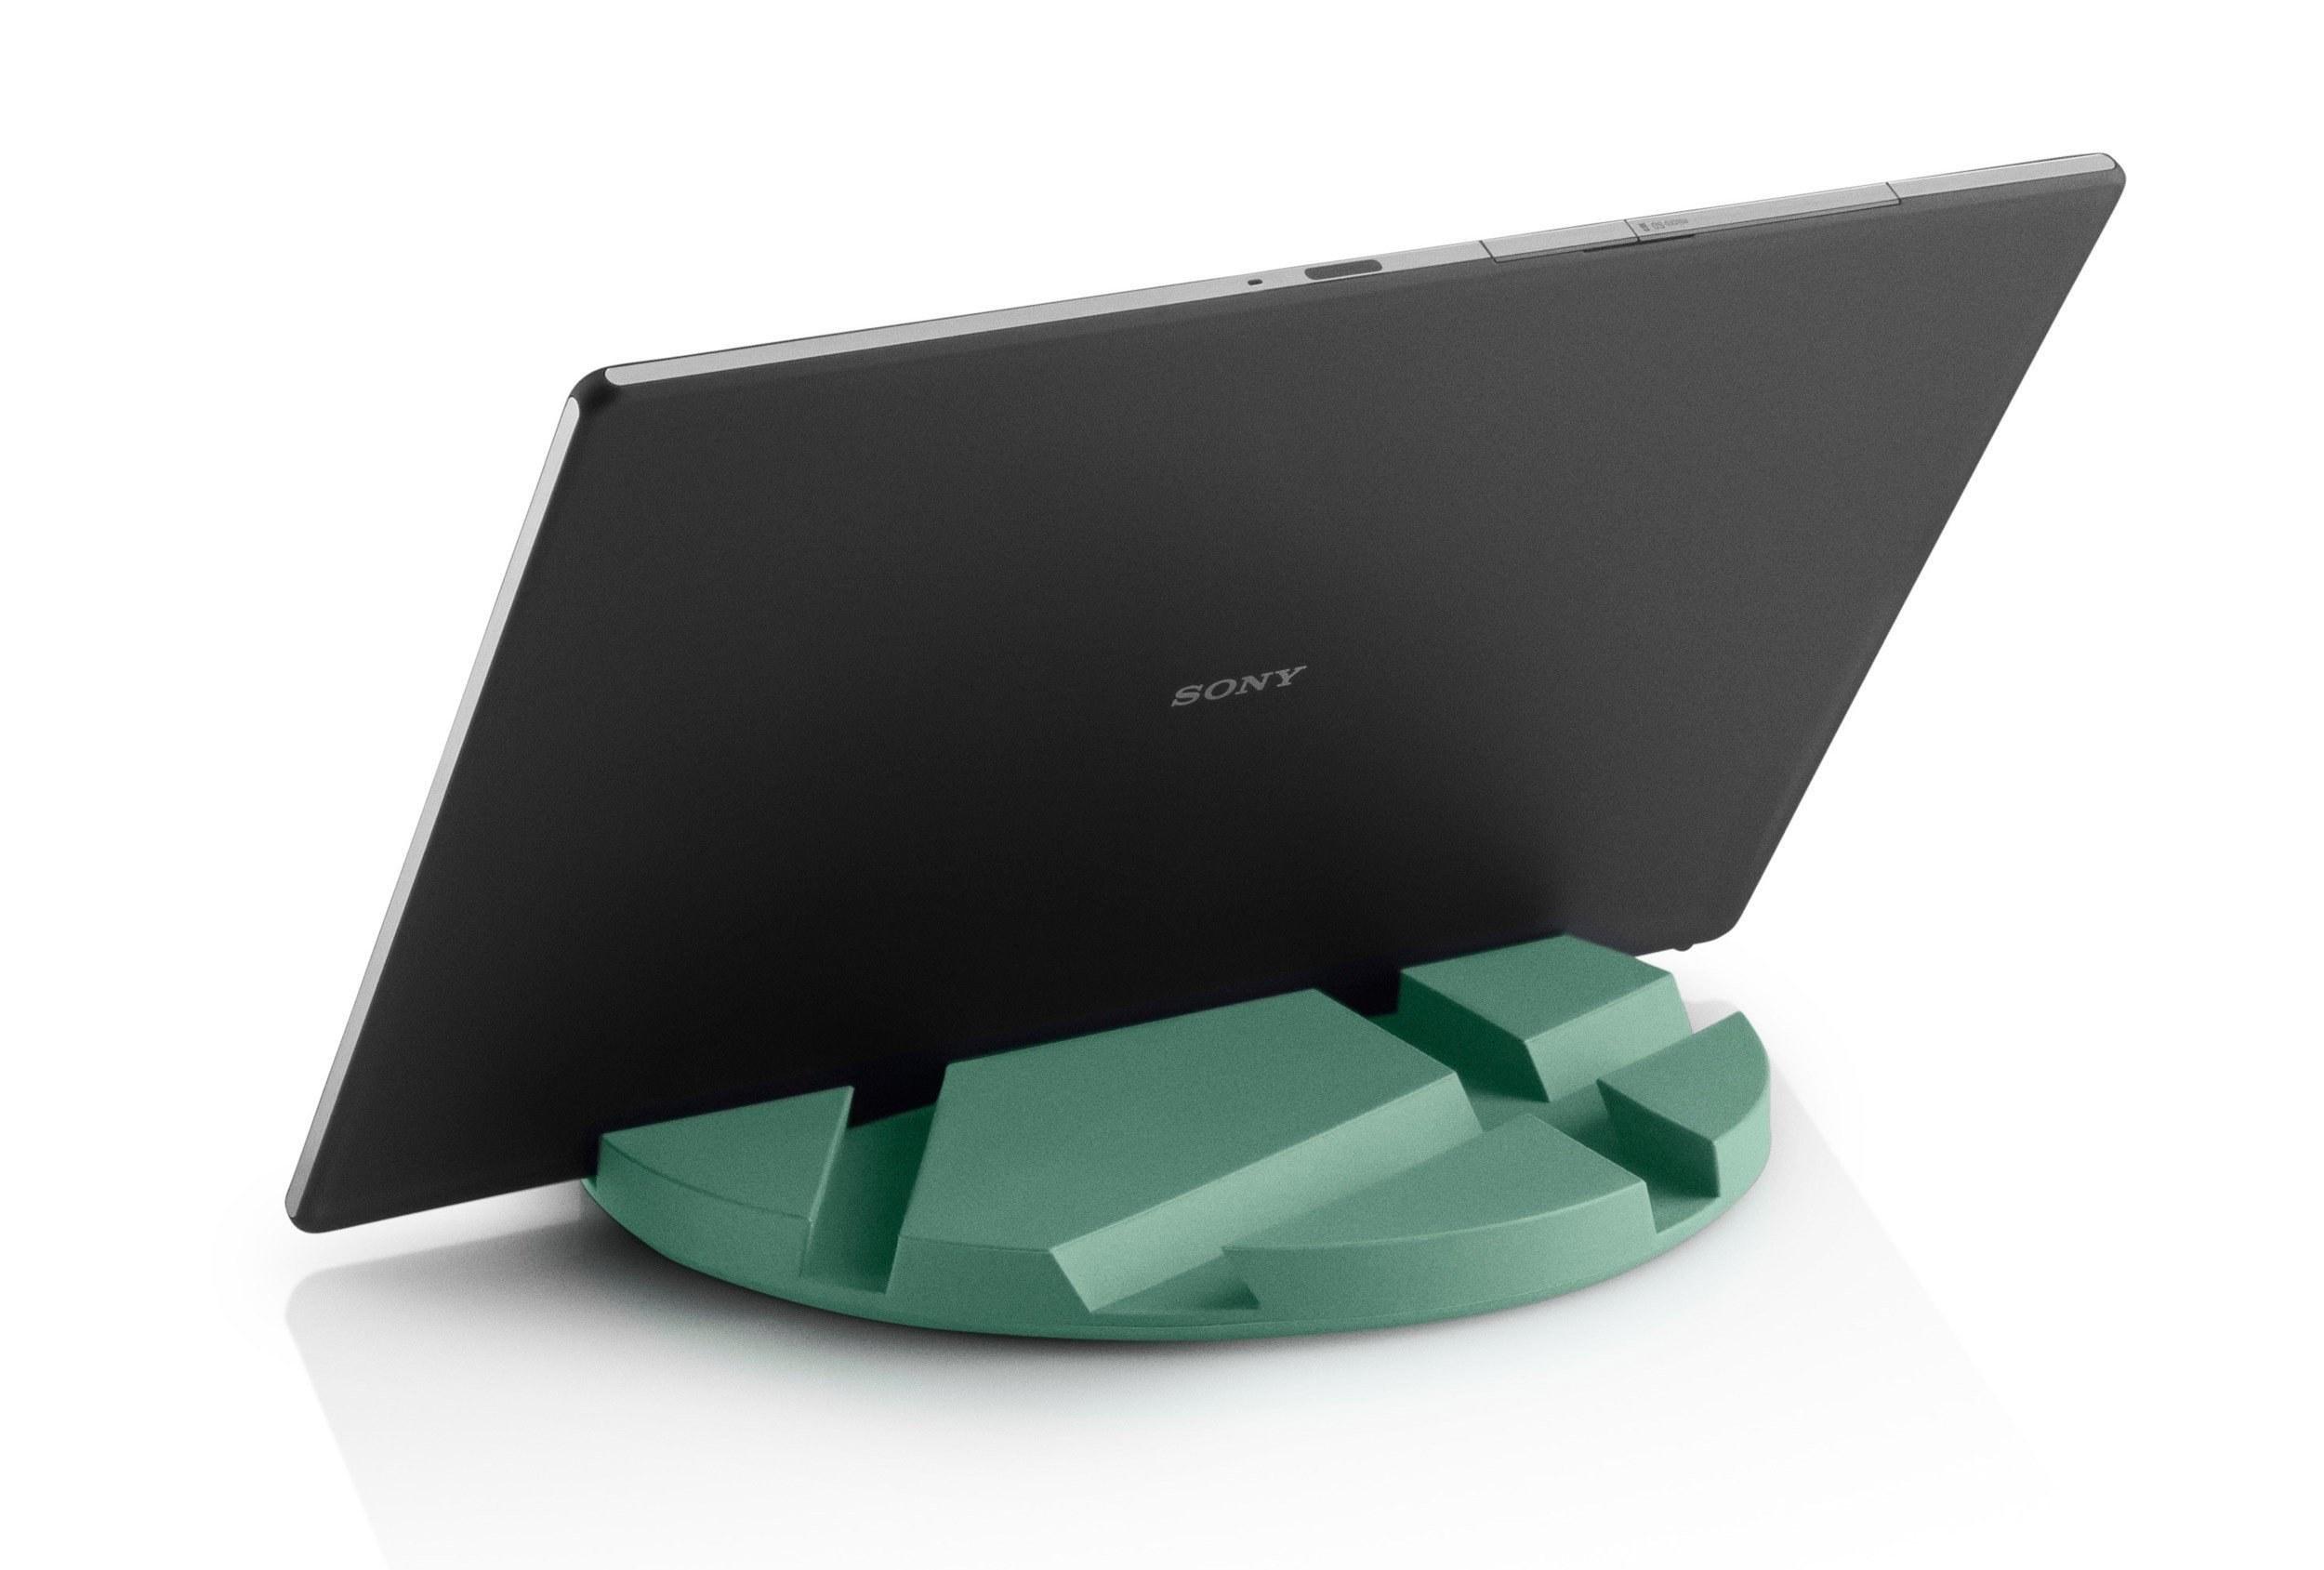 podstawka pod gor ce naczynie i tablet smartmat eva solo ff. Black Bedroom Furniture Sets. Home Design Ideas